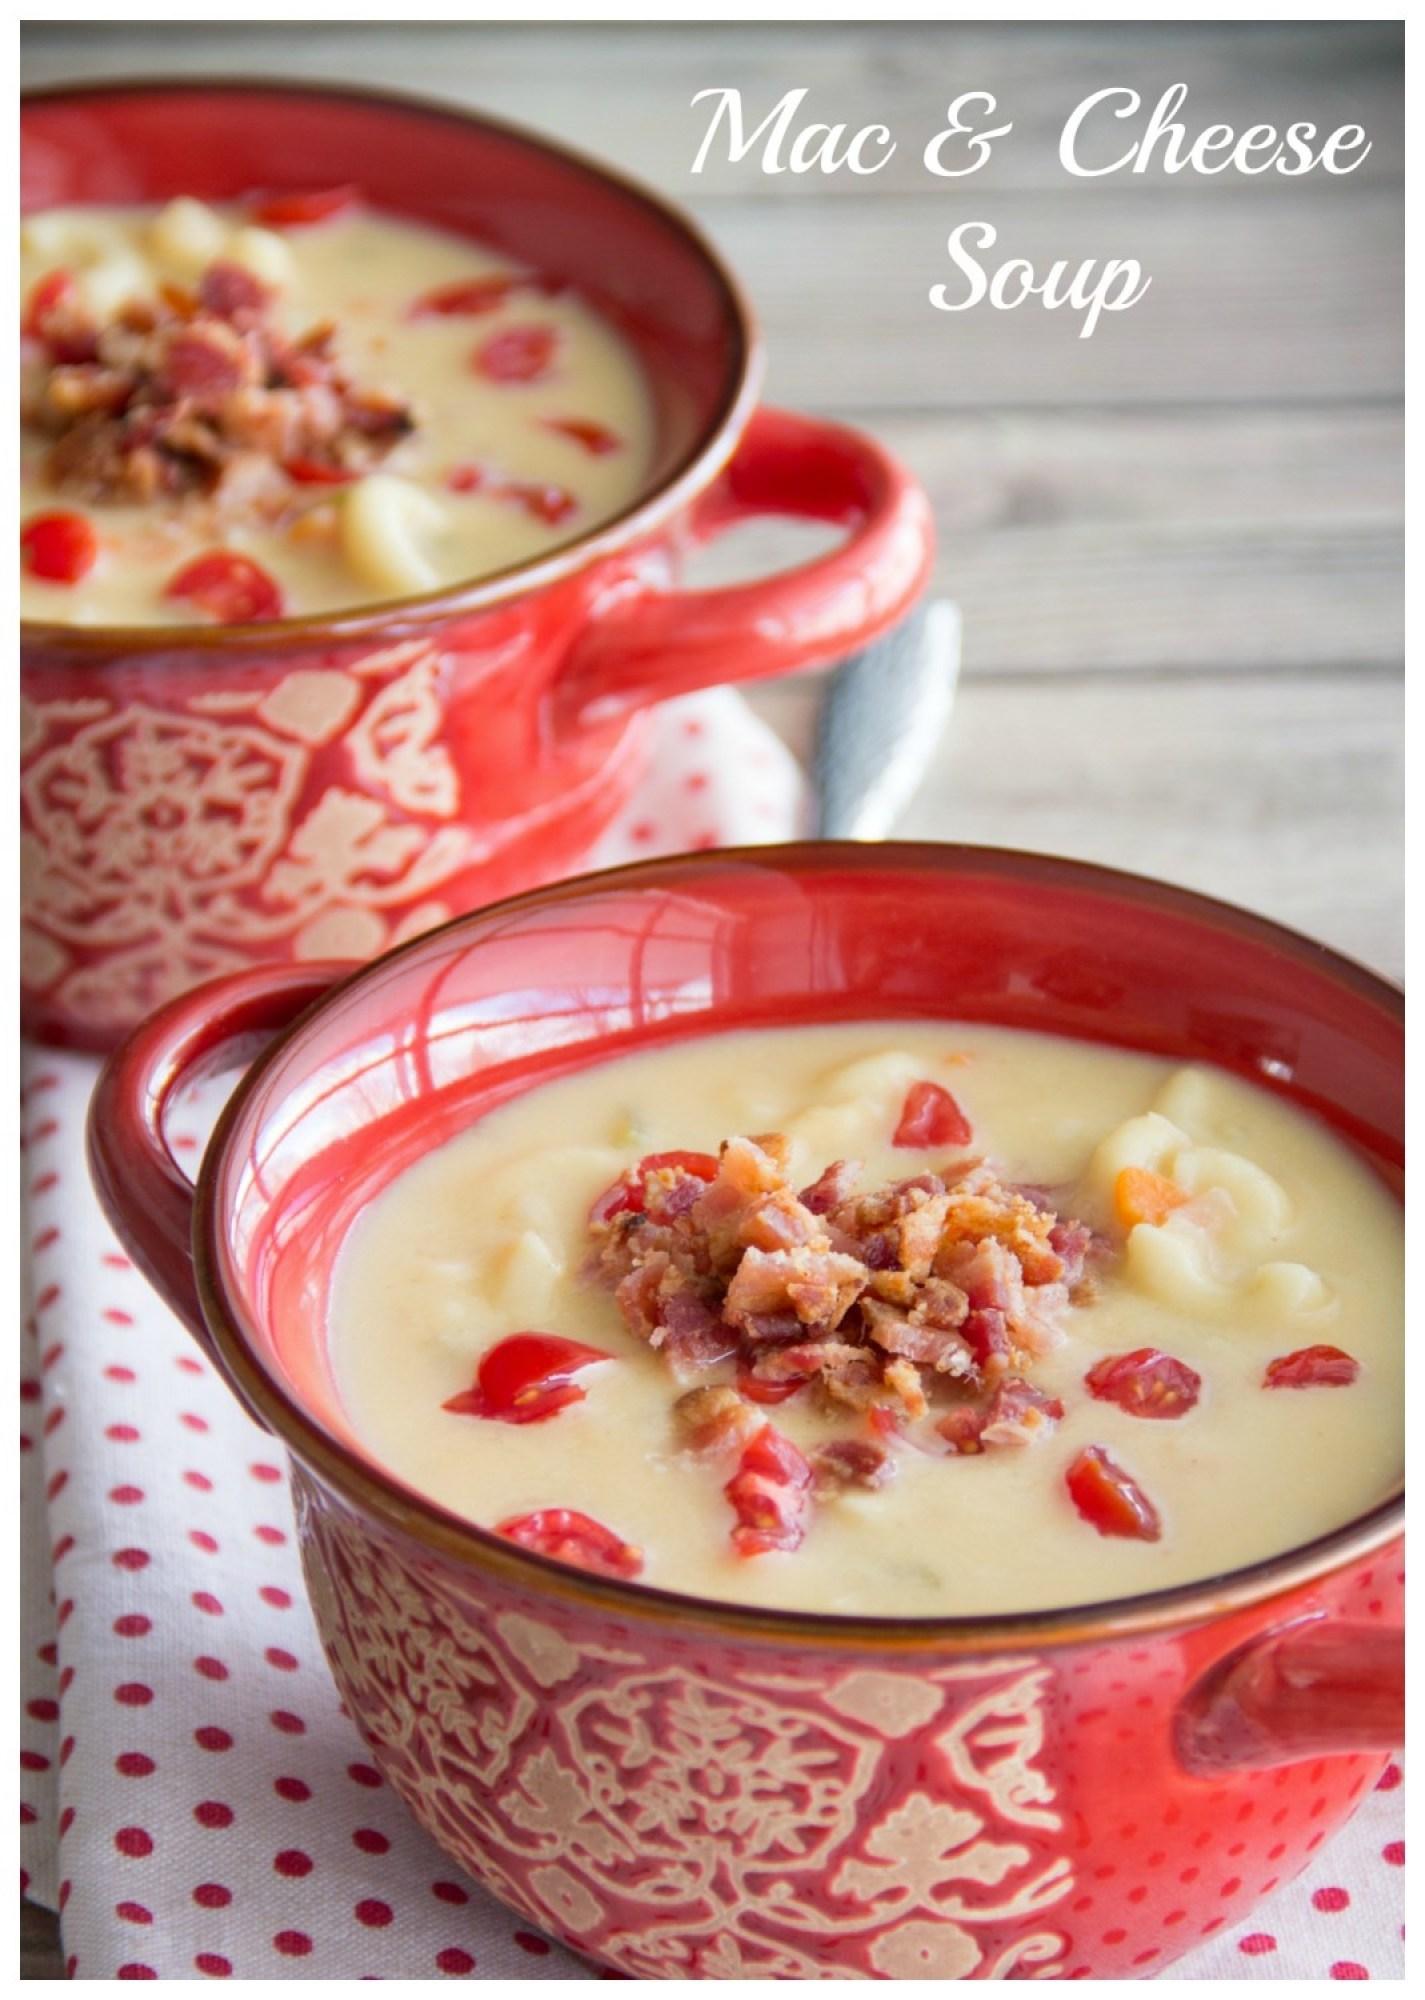 Mac & Cheese Soup